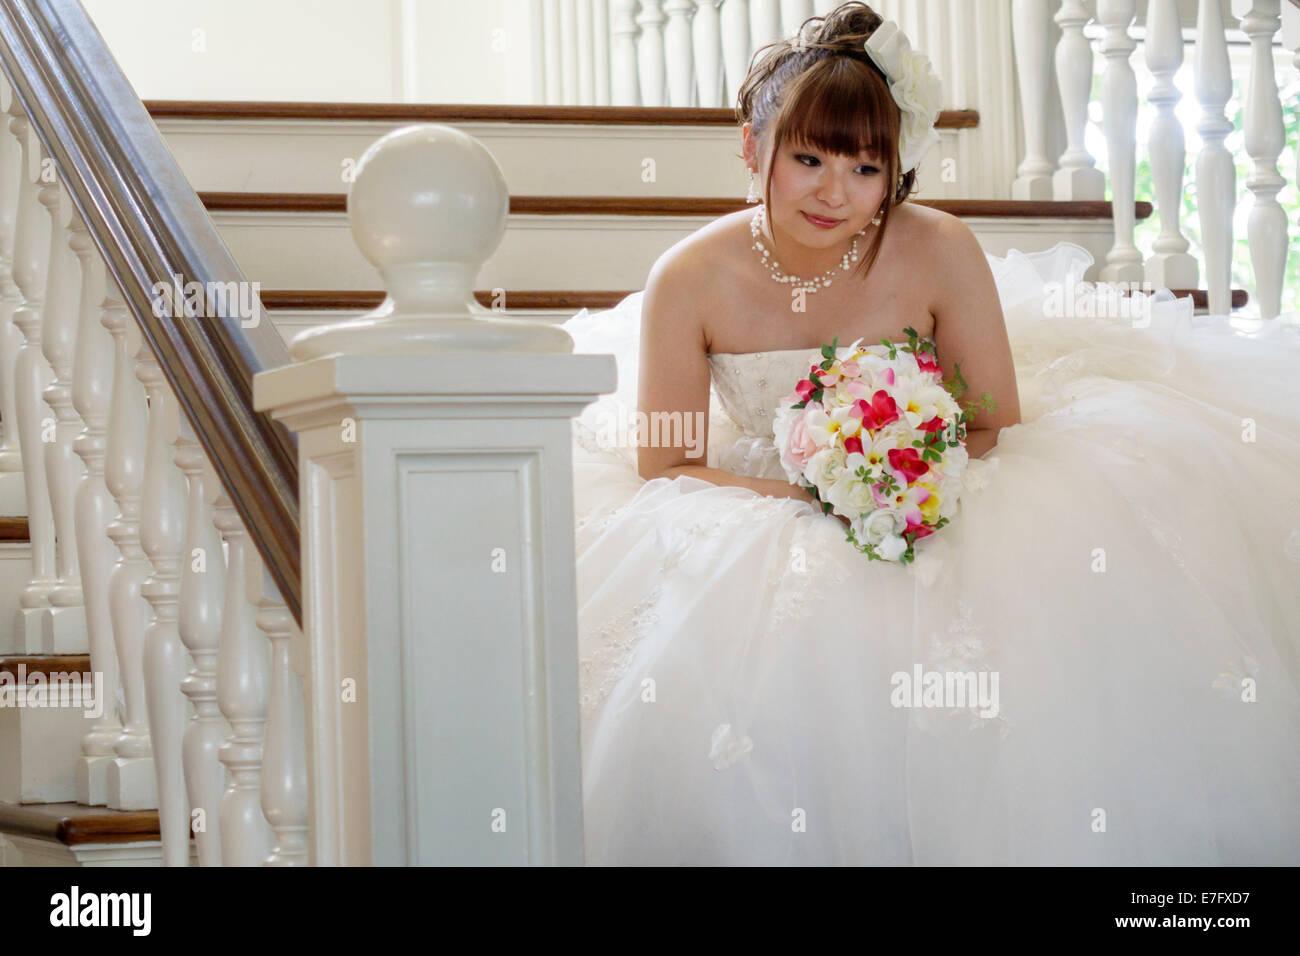 Wedding Photos Stockfotos & Wedding Photos Bilder - Alamy